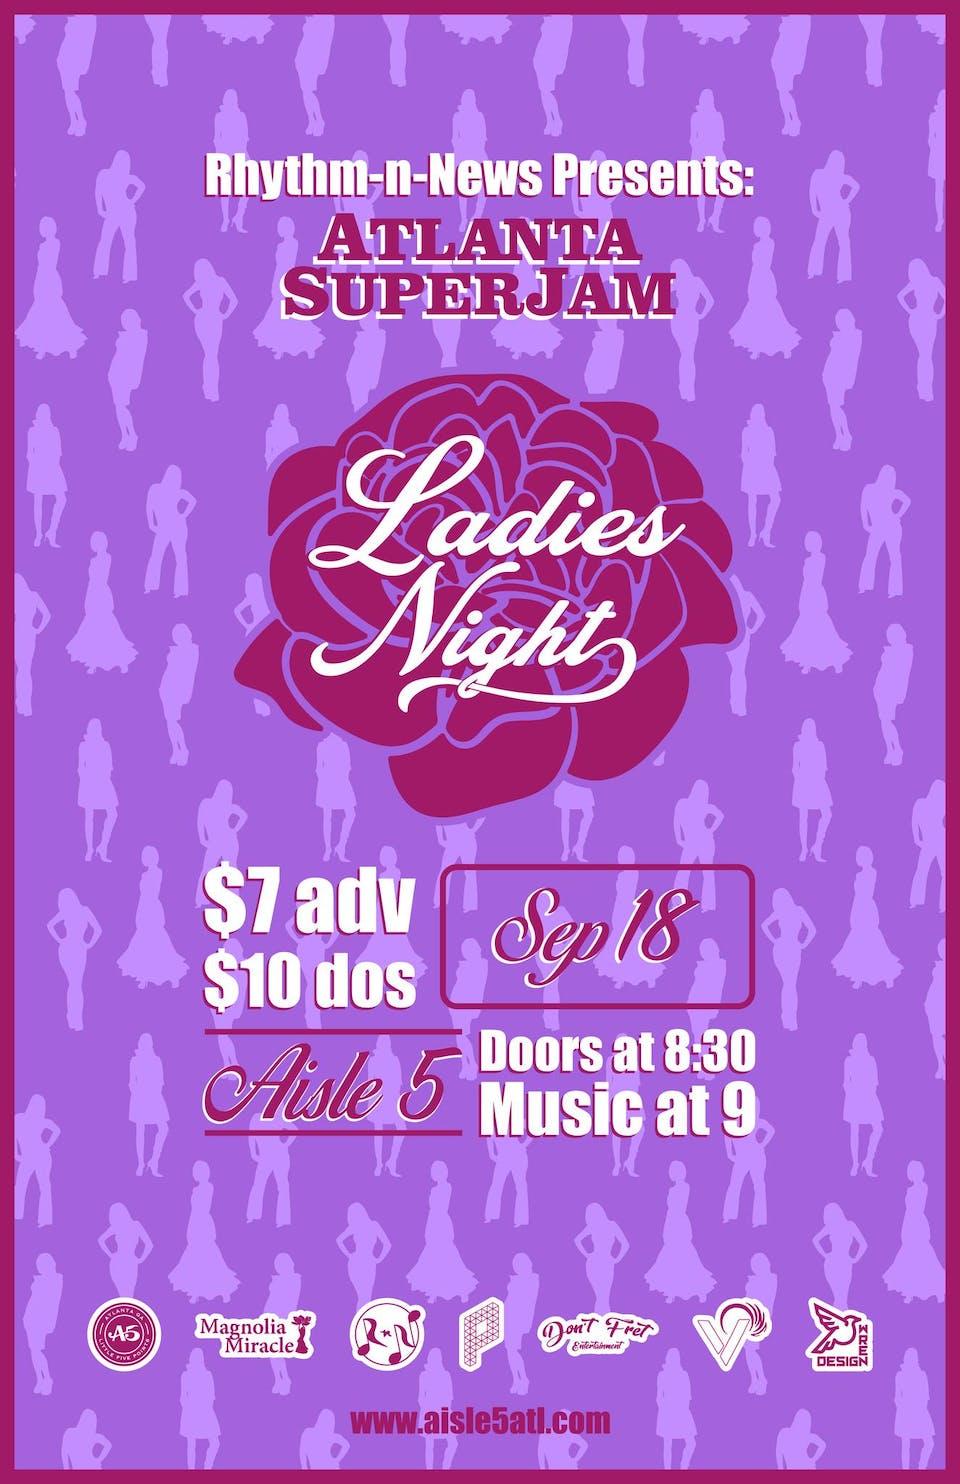 Atlanta SuperJam : Ladies Night